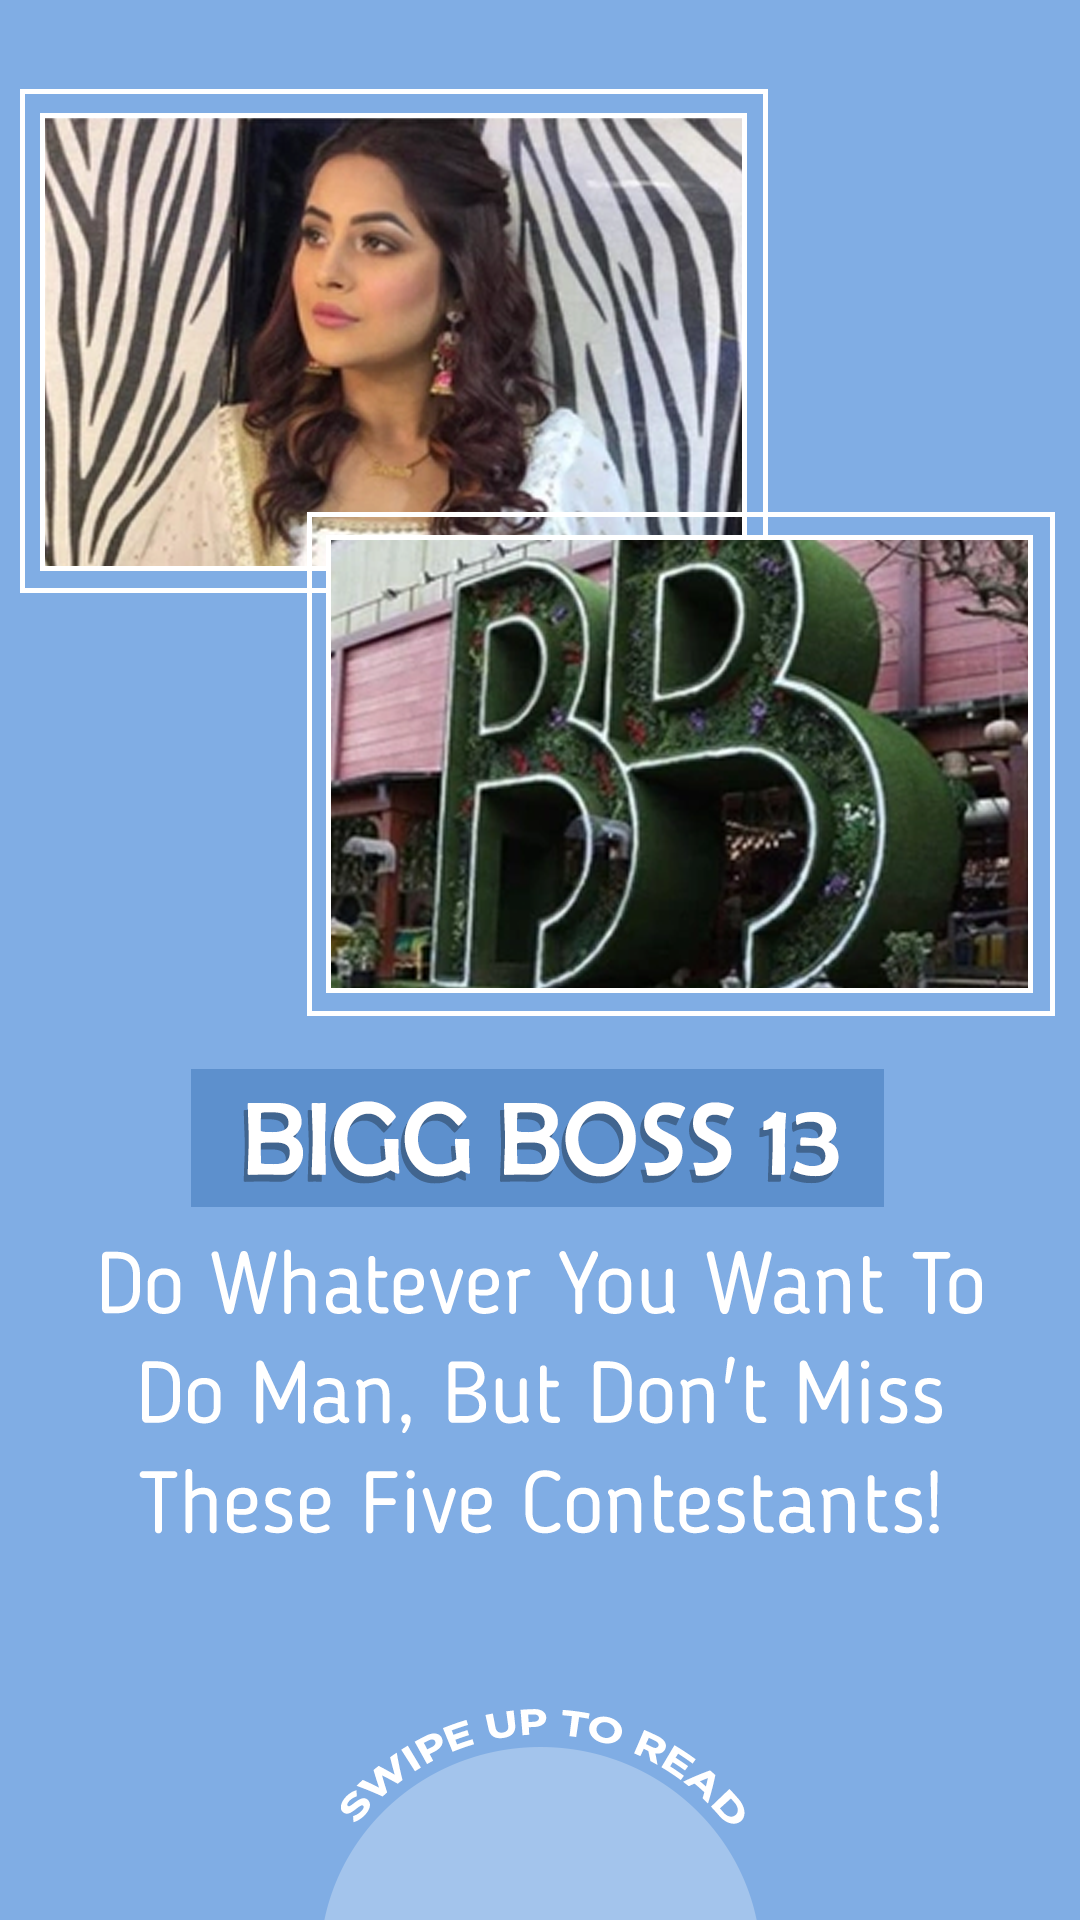 Bigg Boss 13 Do Whatever You Want To Do Man But Don T Miss These Five Contestants Bigboss Bigboss13 Salmankhan Do Men Boss Man